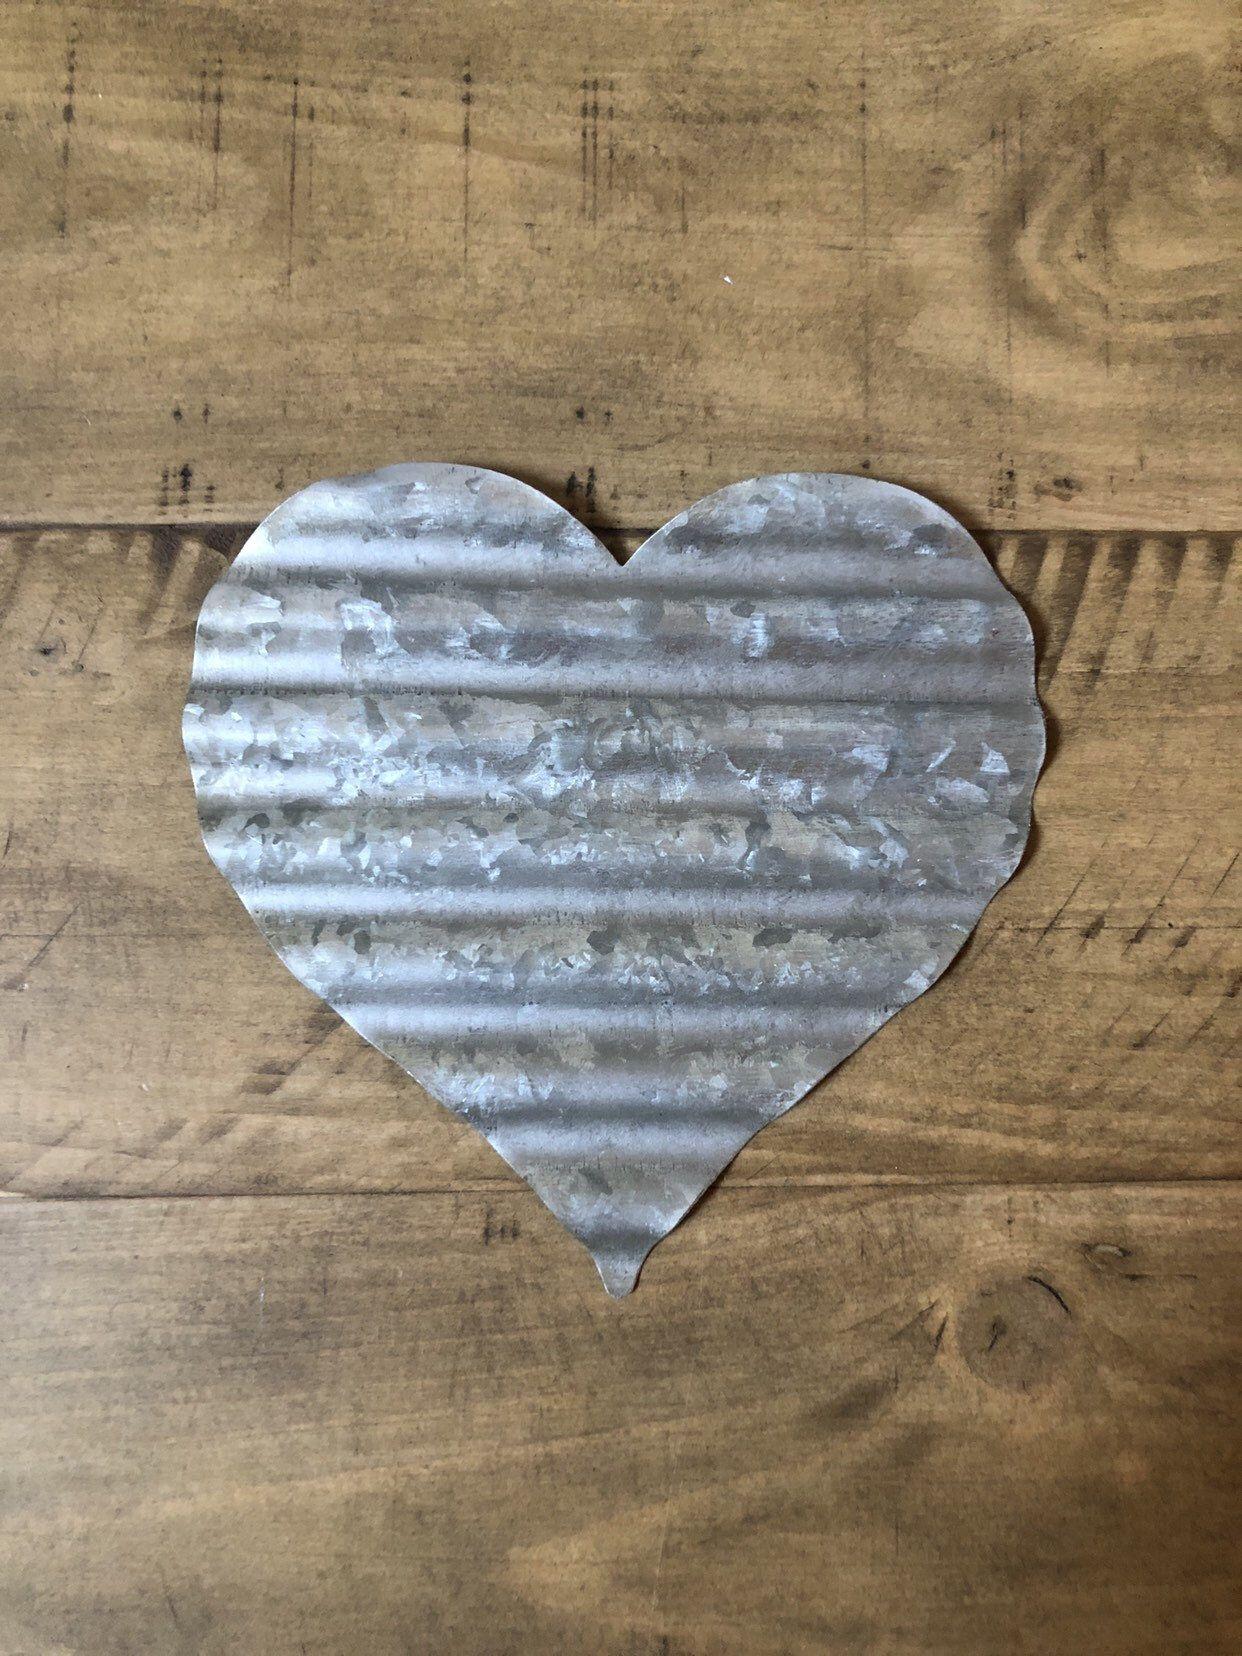 Metal Heart Metal Letter Corrugated Metal Galvanized Letter Rustic Heart Bridal Shower Heart Heart Centerpiece Nursery Bridal Gift Corrugated Metal Metal Letters Metal Heart